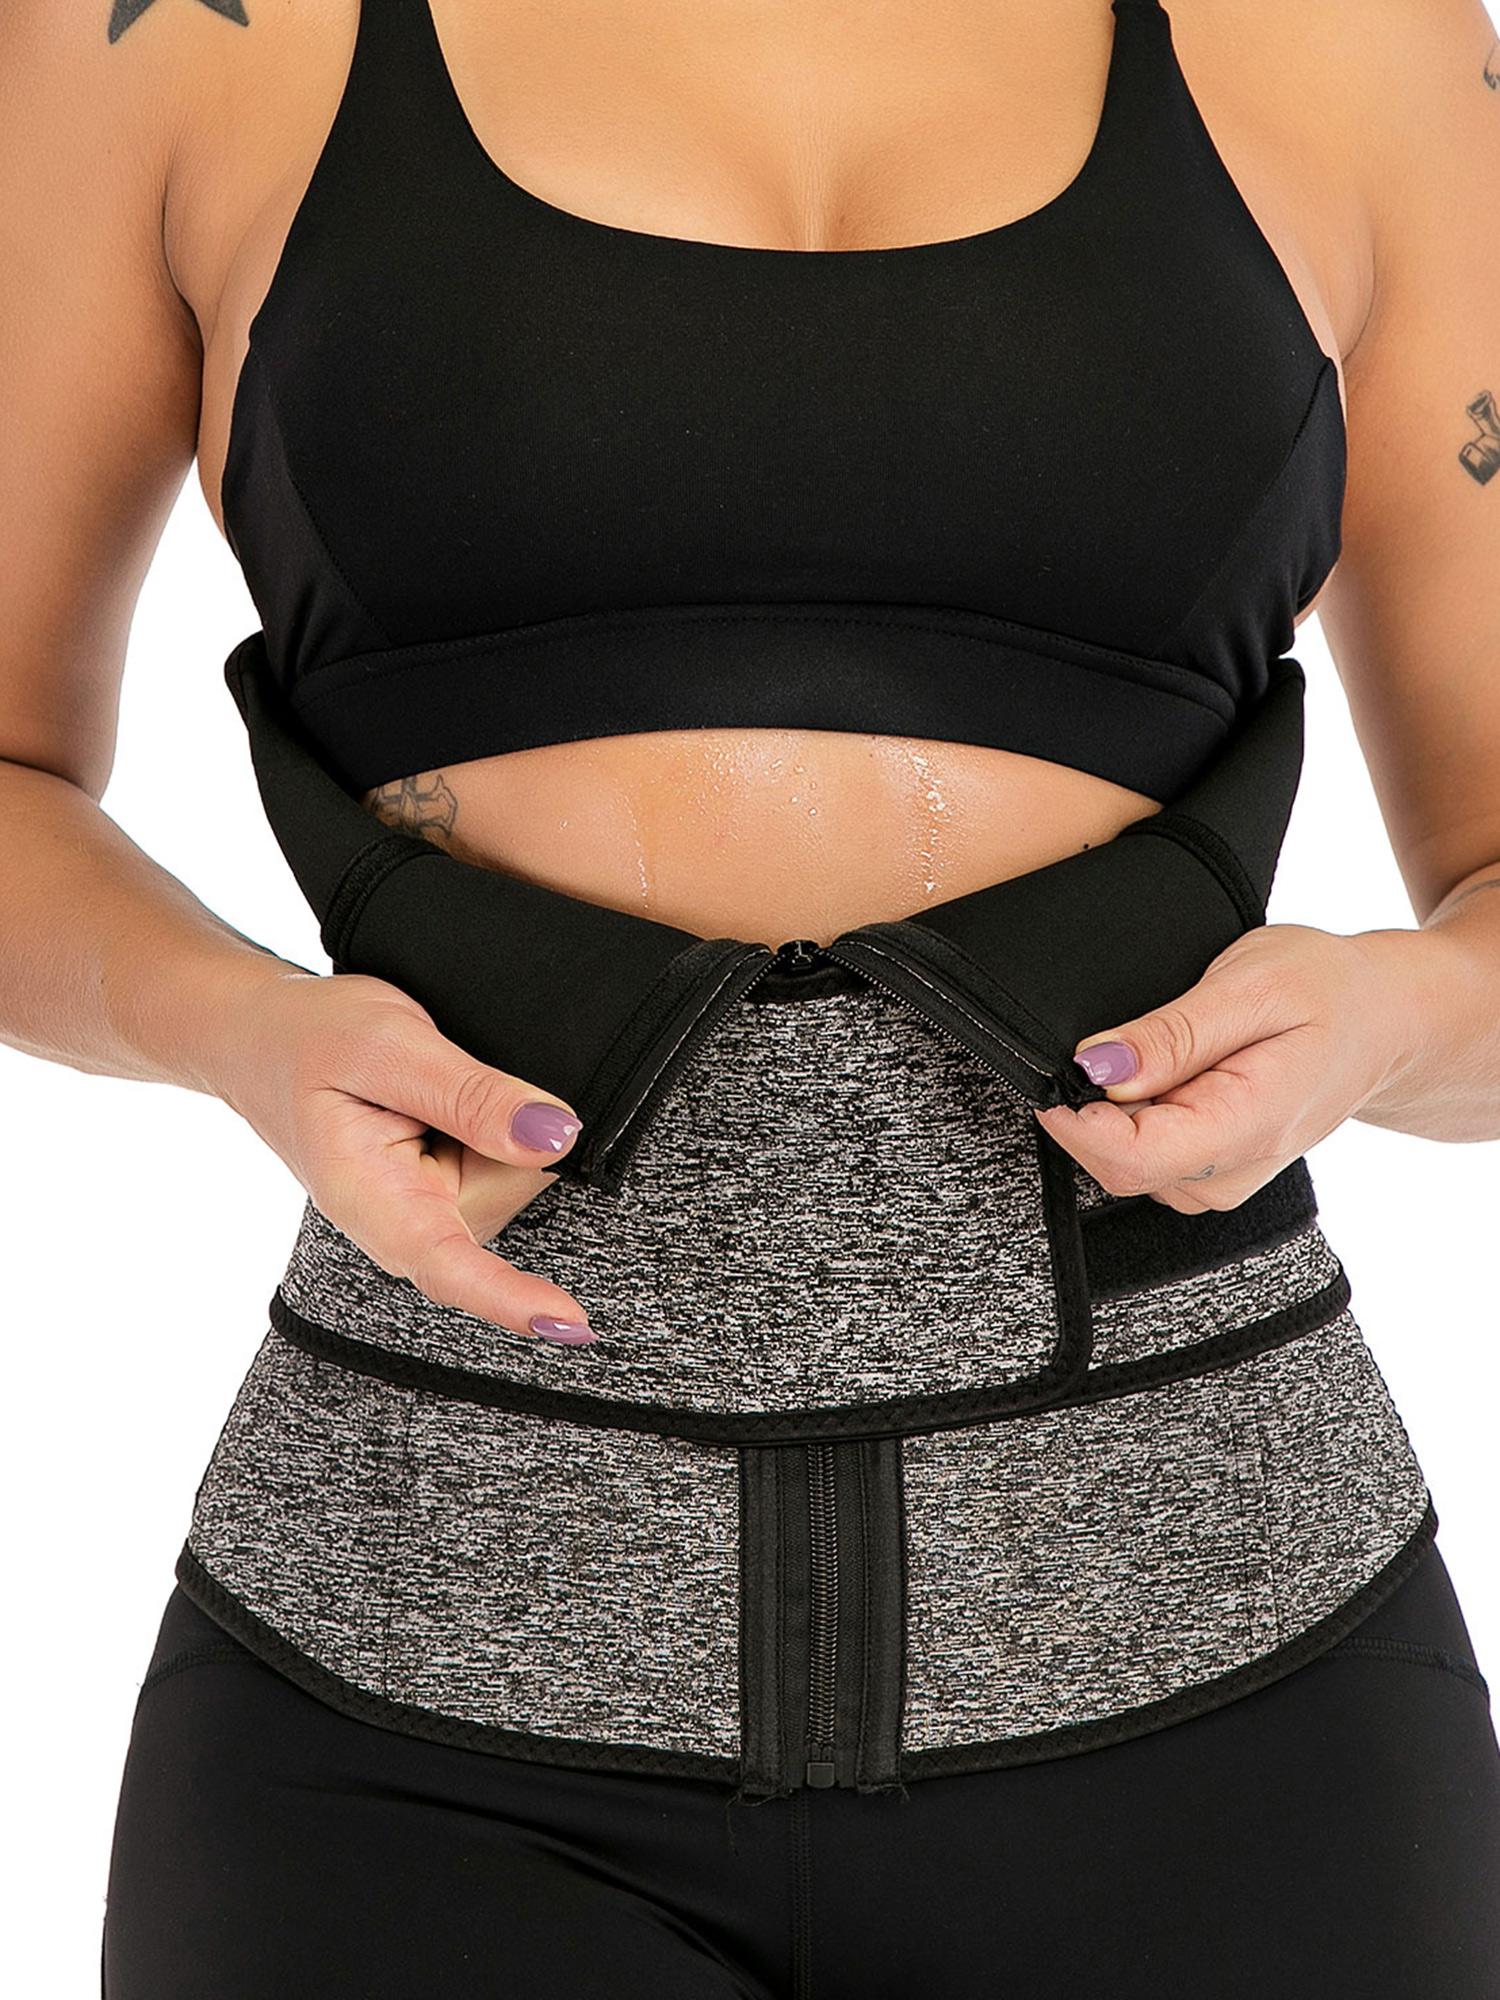 Women Waist Sweat Trainer Shaper Belt Band Body Sport Trimmer Vest Belly Yoga